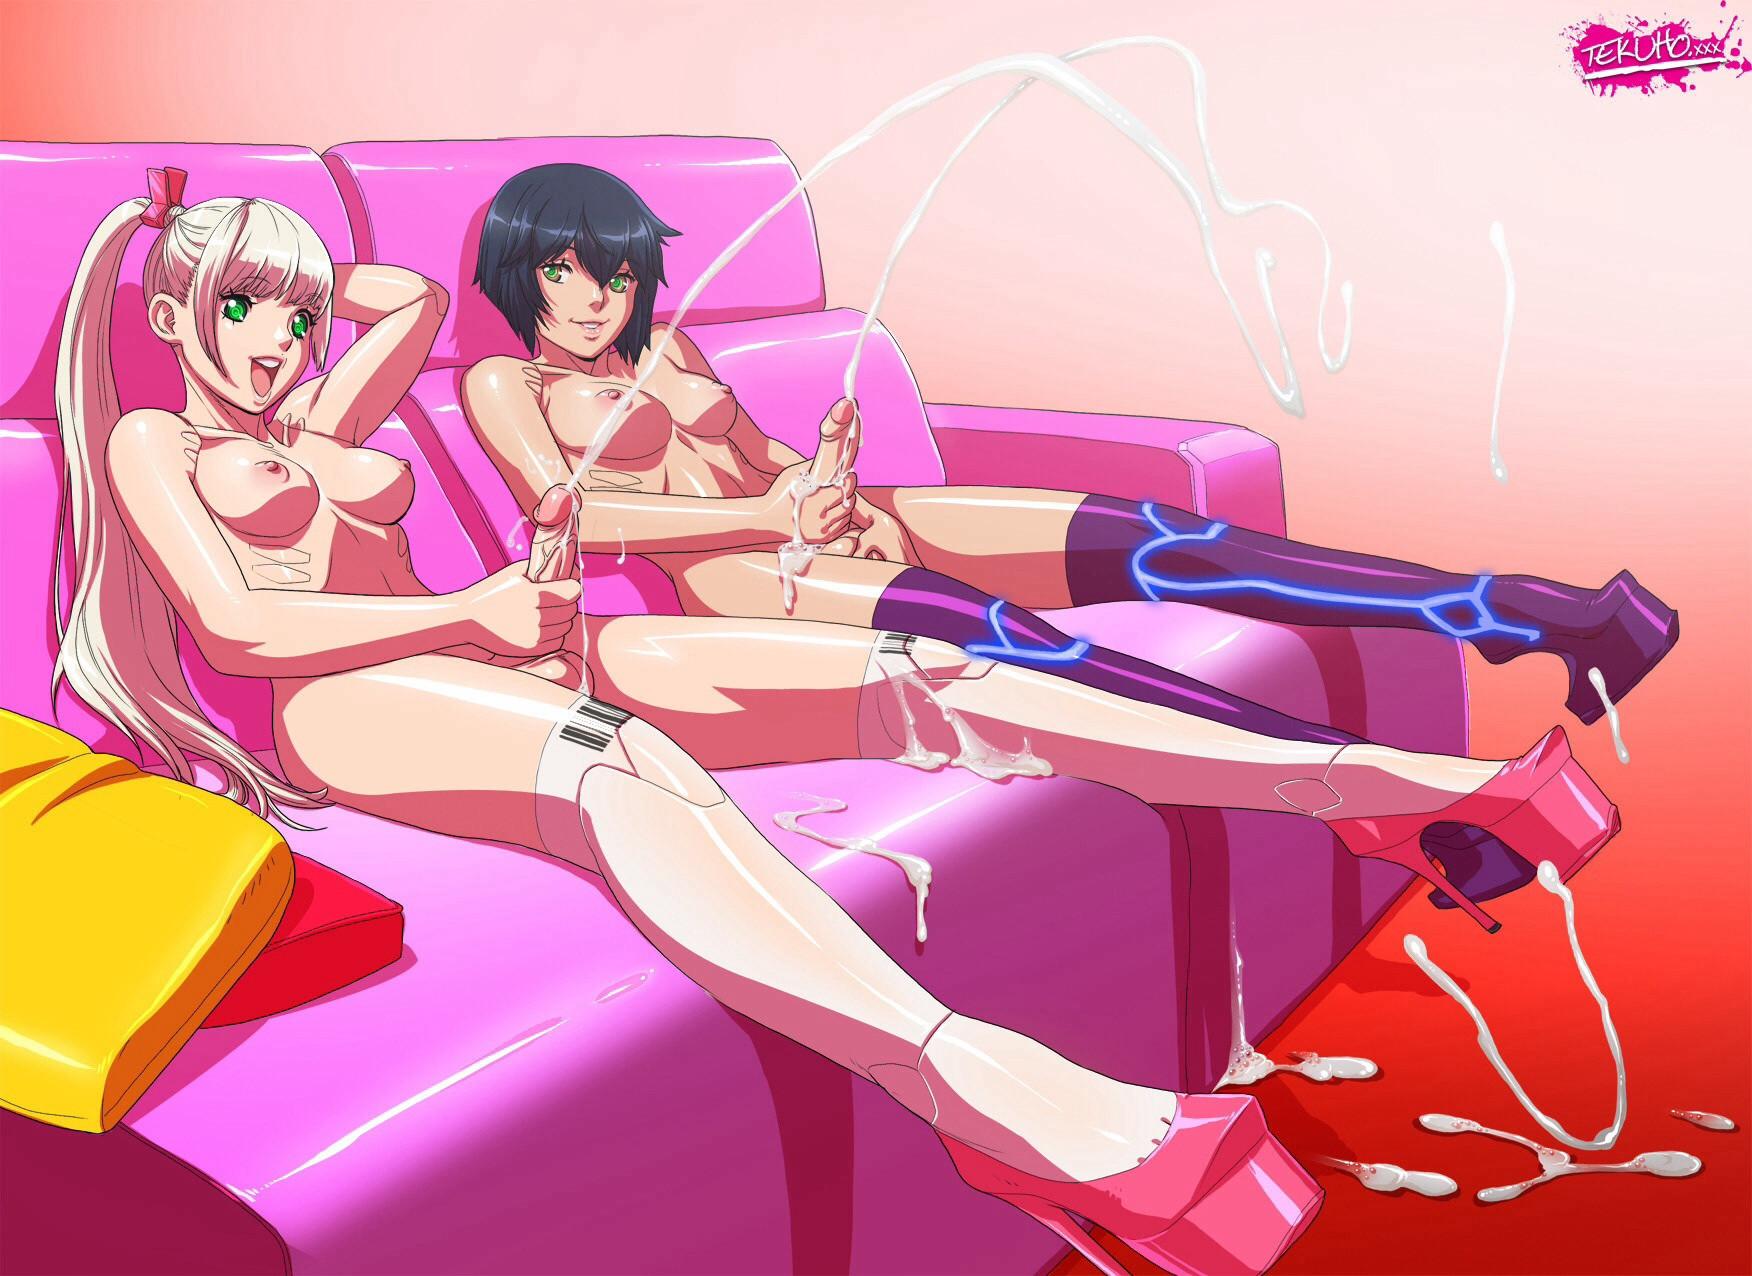 Anime tranny cum shots